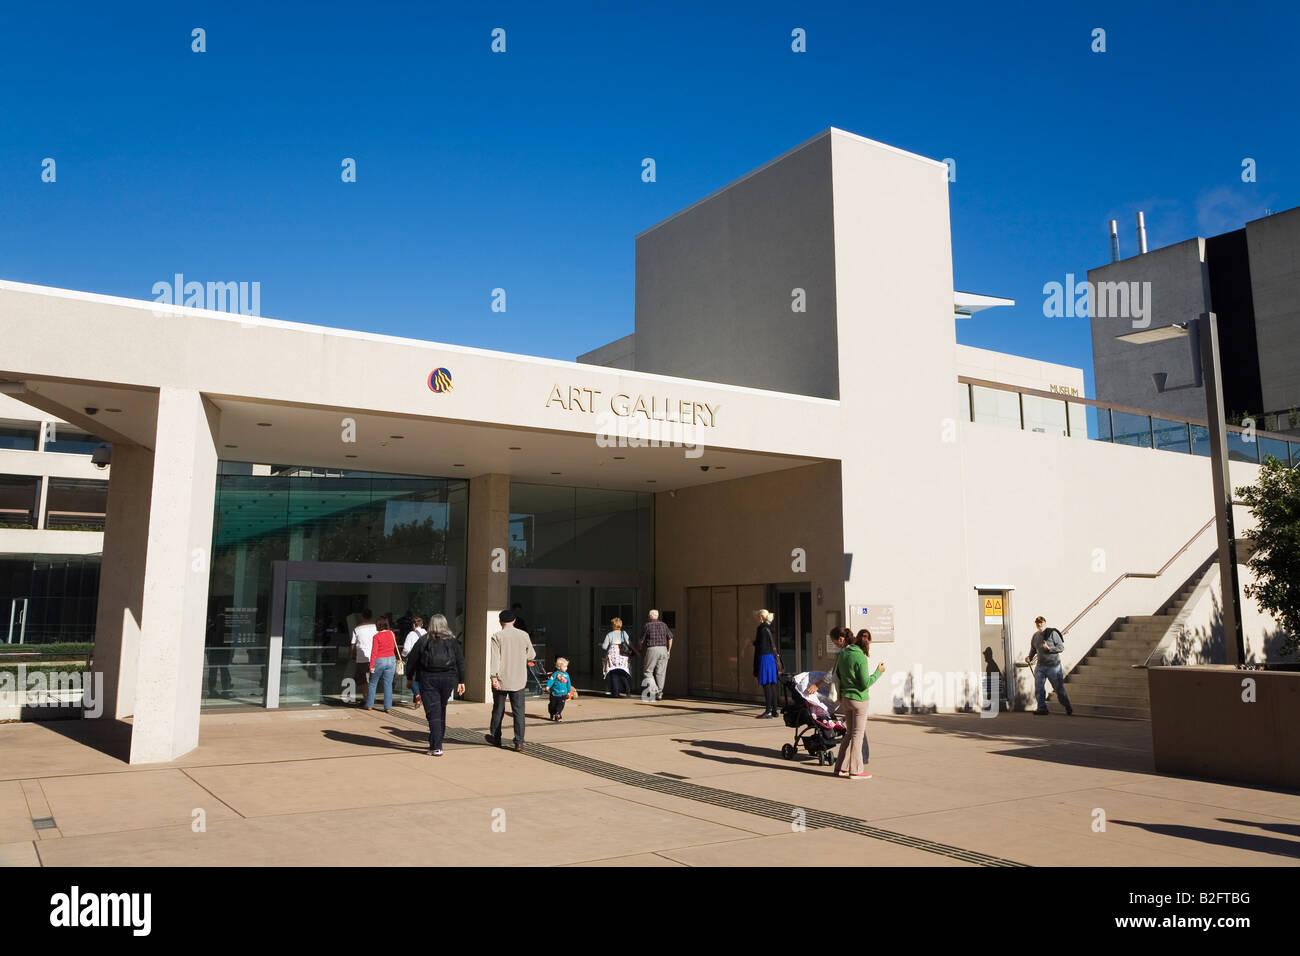 Art Gallery - Brisbane, Queensland, AUSTRALIA - Stock Image